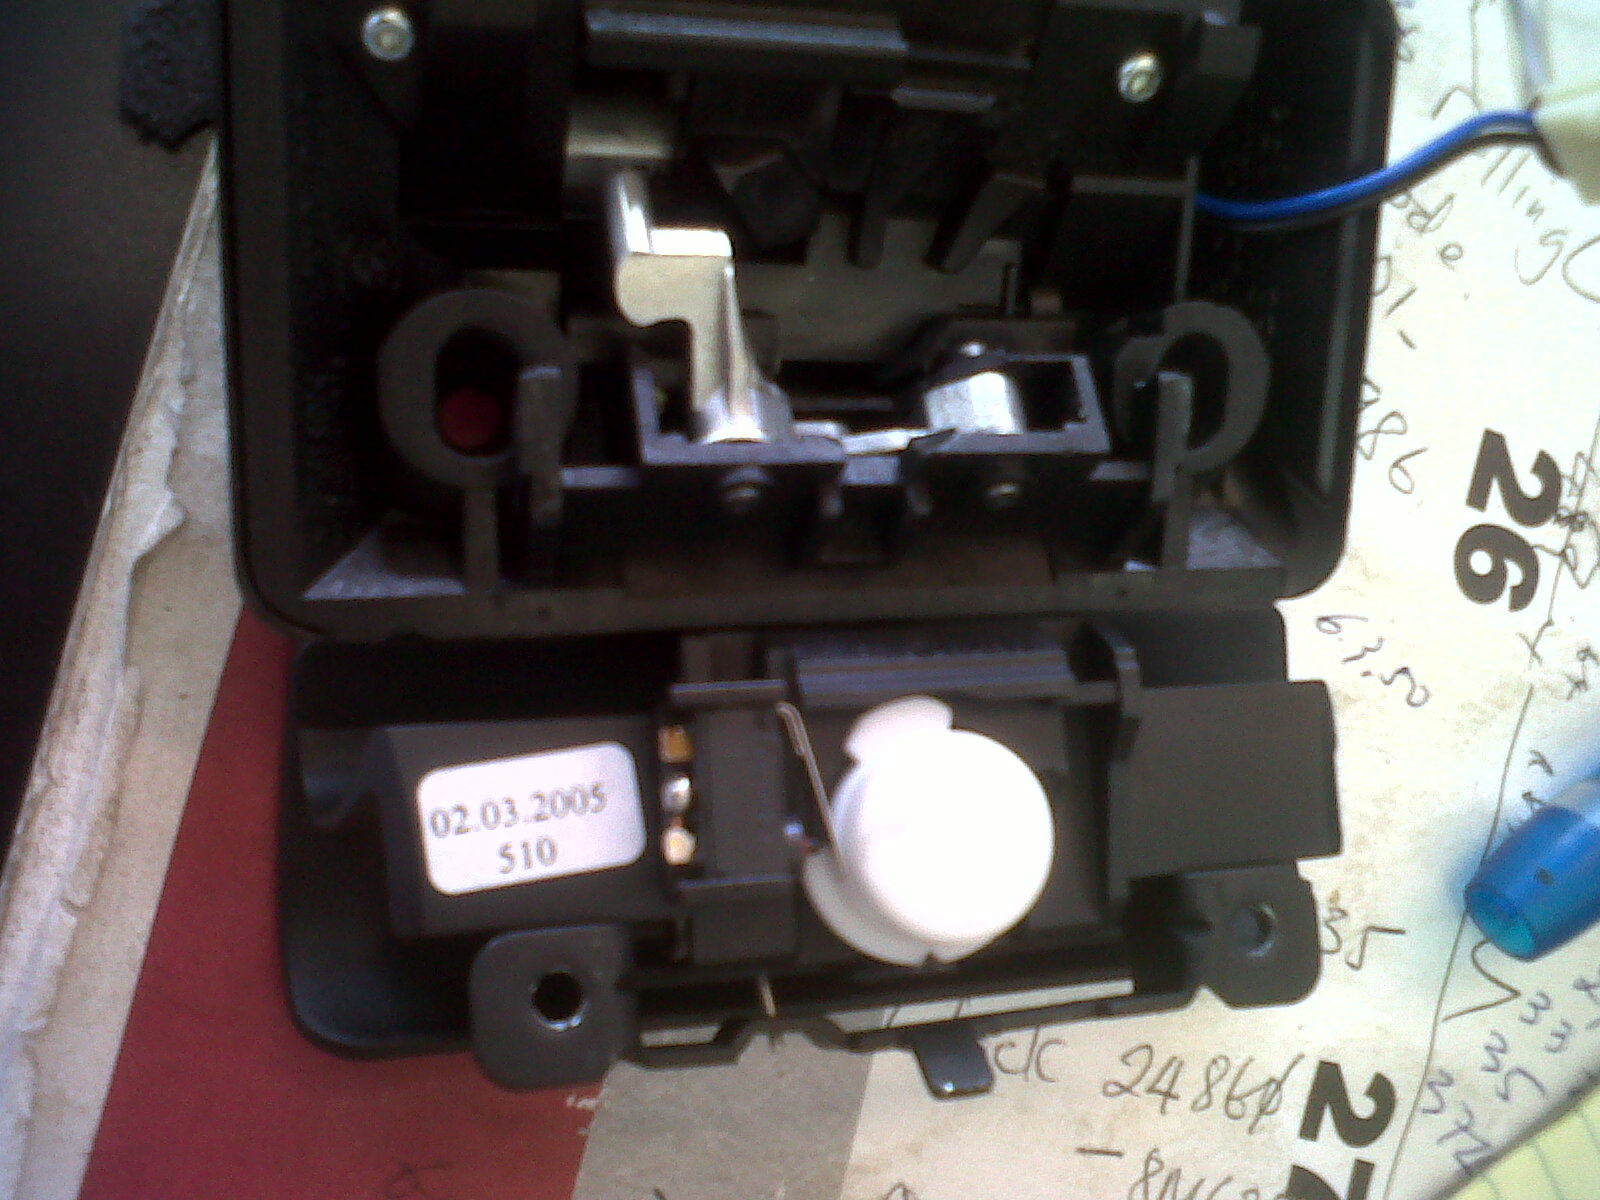 05 Bmw 330ci Convertible Glove Box Lock Problem Bmw